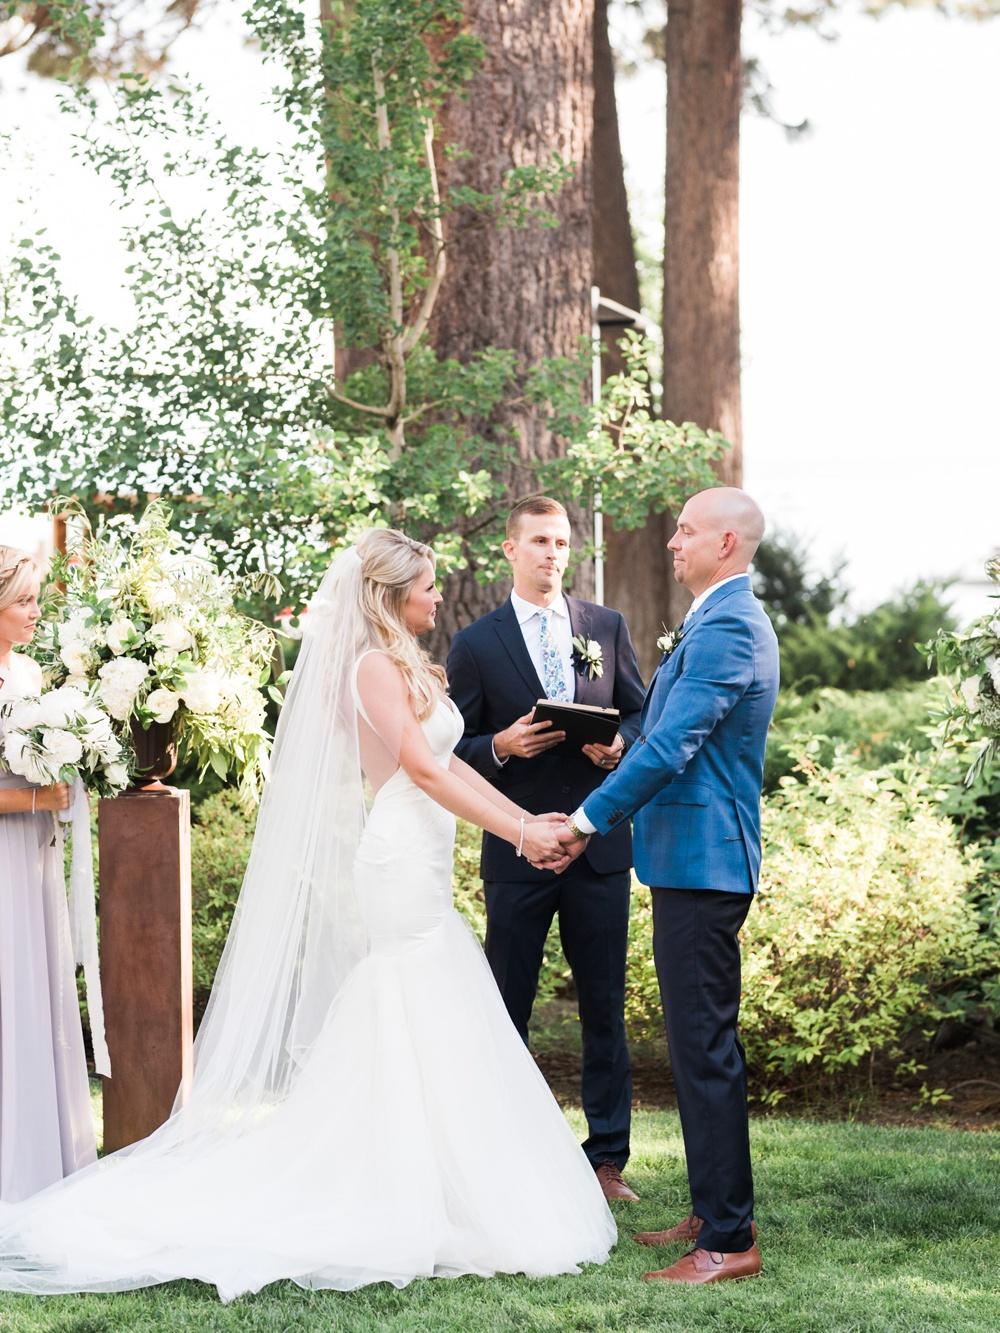 Hyatt-Lake-Tahoe-Wedding-Photographer-Regency-Mandy-Ford-Photography_0040.jpg